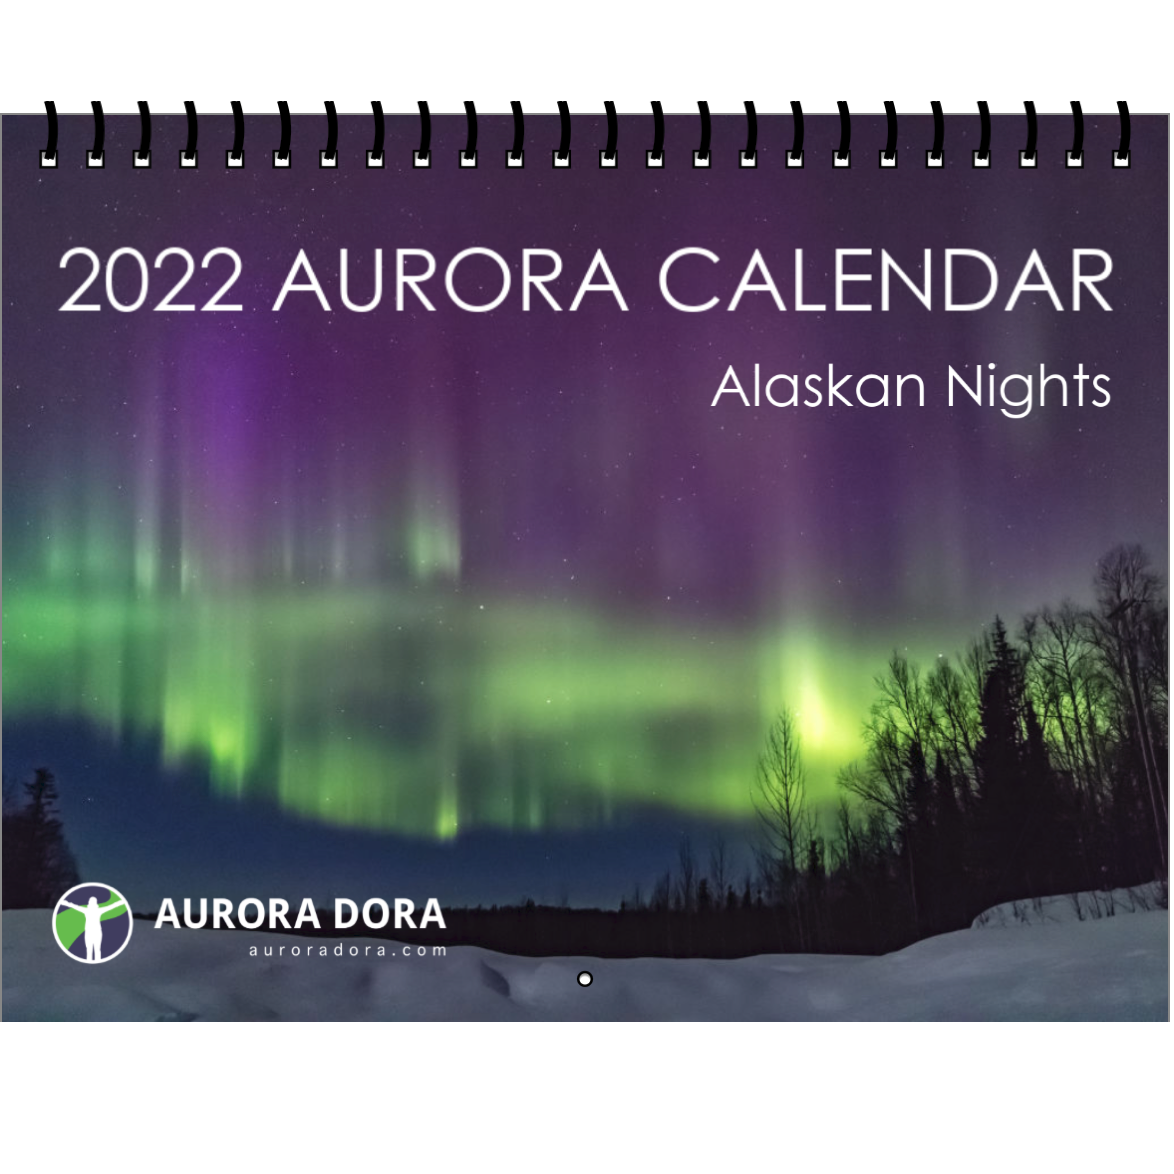 2022 Aurora Calendar